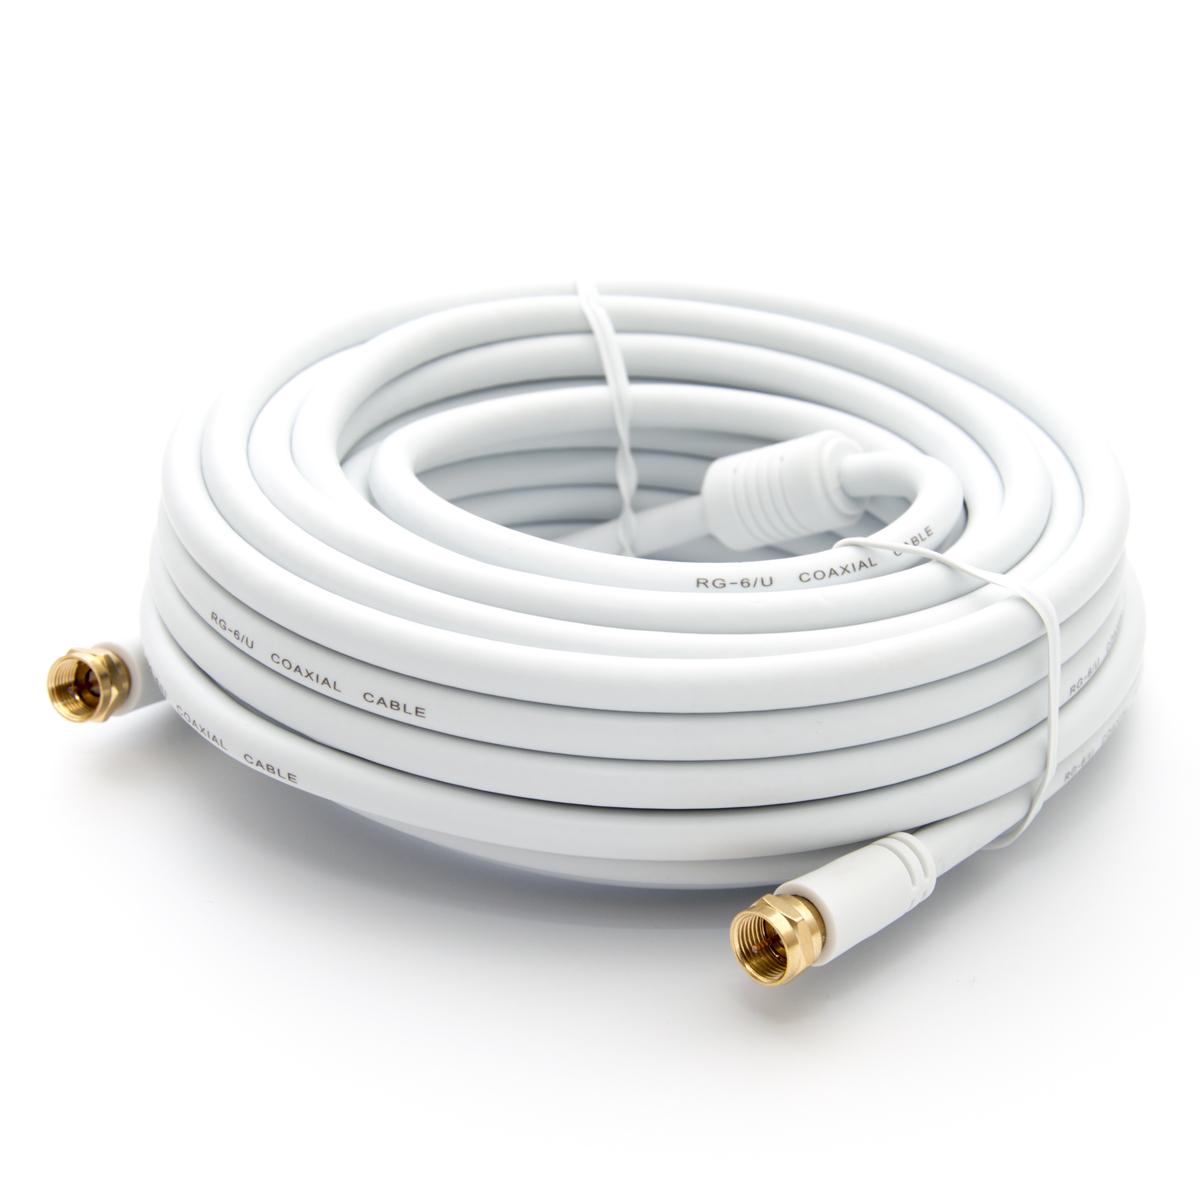 12,5m PremiumX HDTV Sat Antennenkabel Koax Kabel vergoldet 75 Ohm Koaxialkabel für Sat-Anlage DVB-S DVB-S2 DVB-T DVB-T2 mit Mantelstromfilter – 2x Ferritkern – Weiß